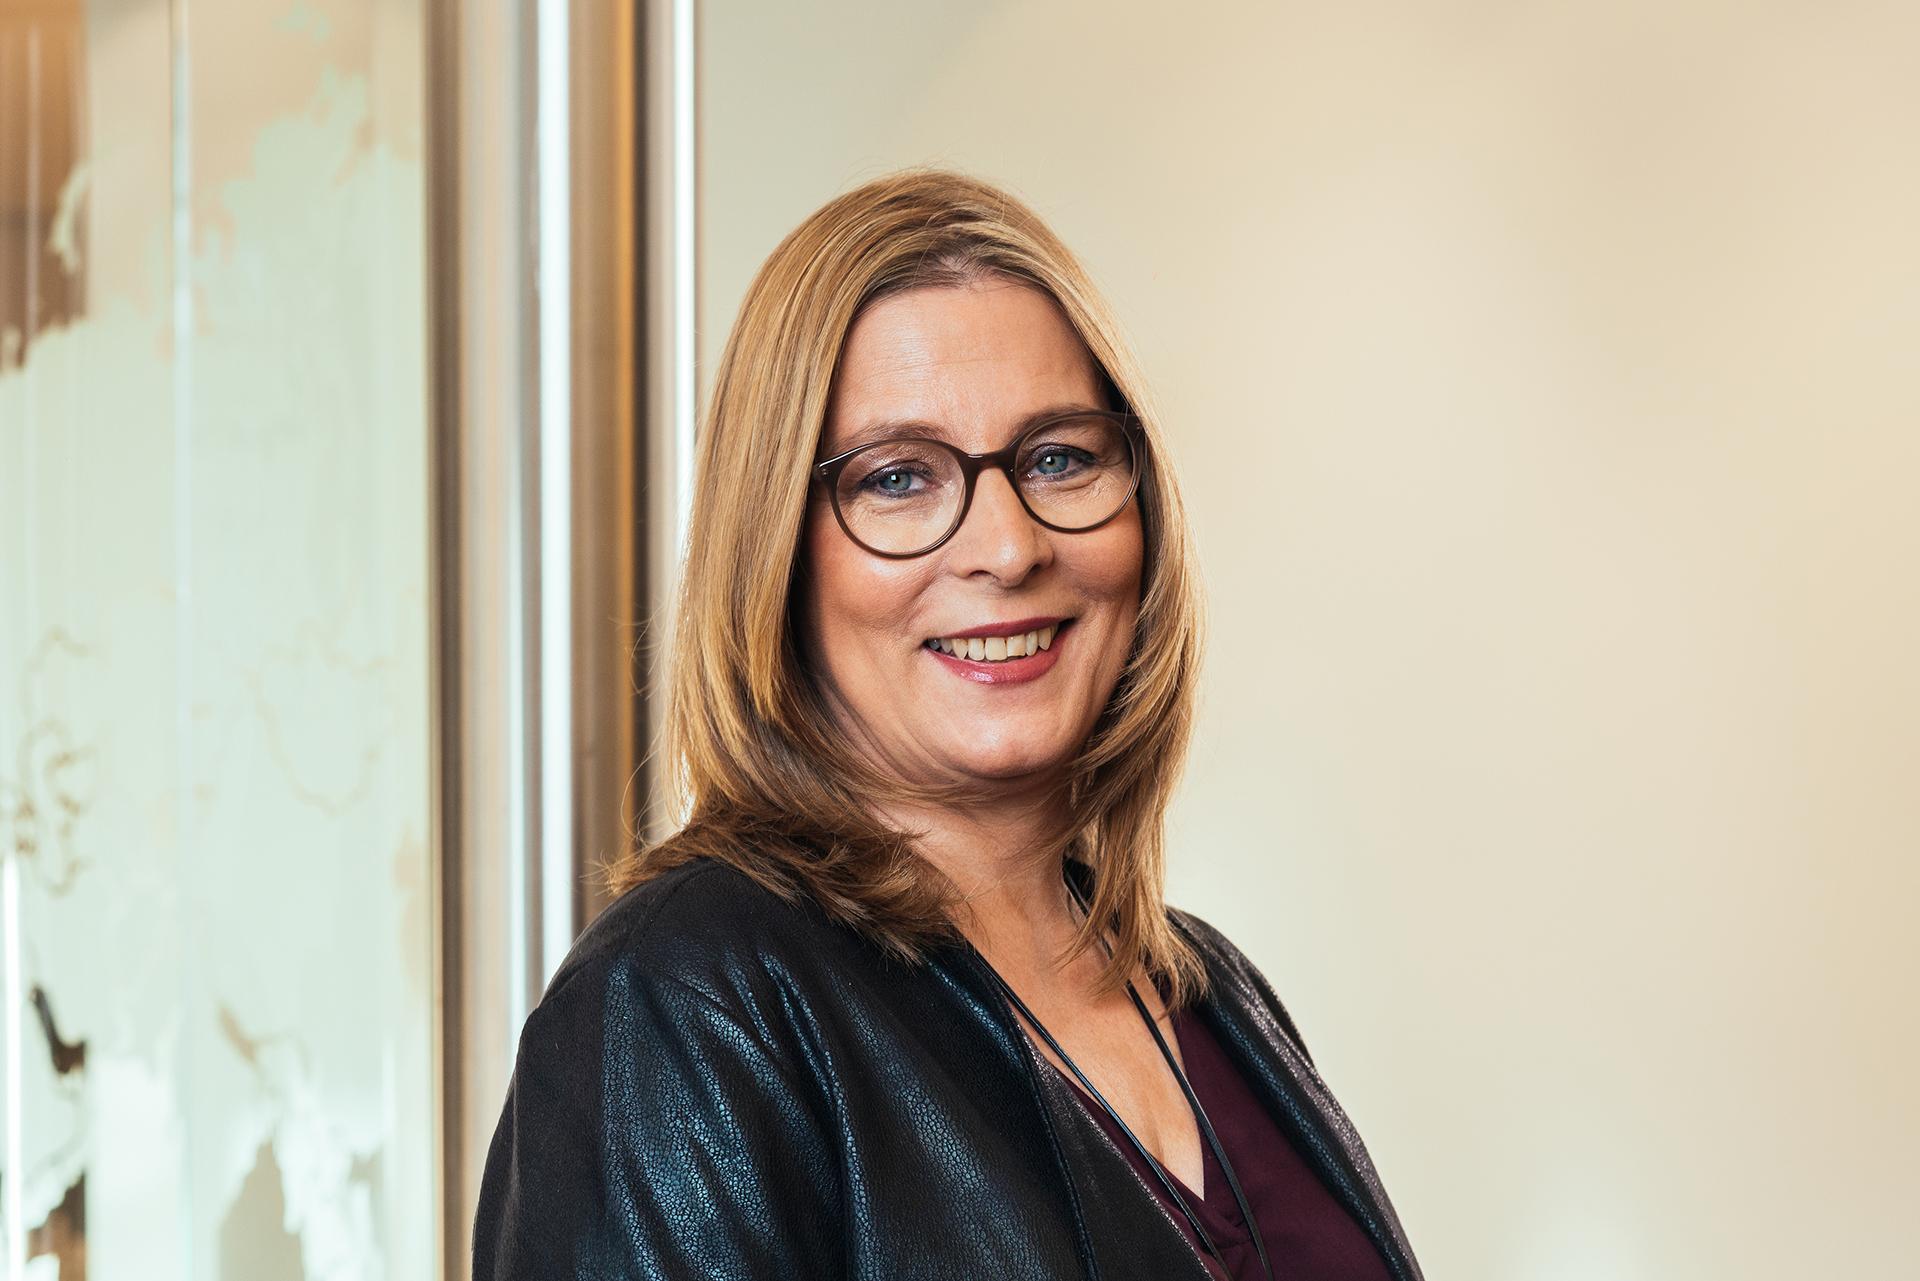 Barbara Schüttler